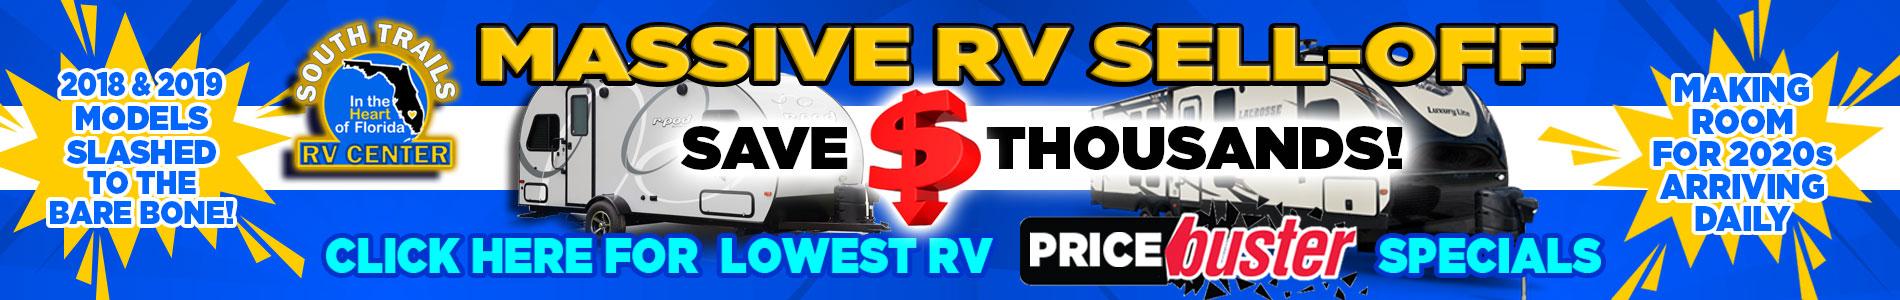 Massive RV Sell-Off